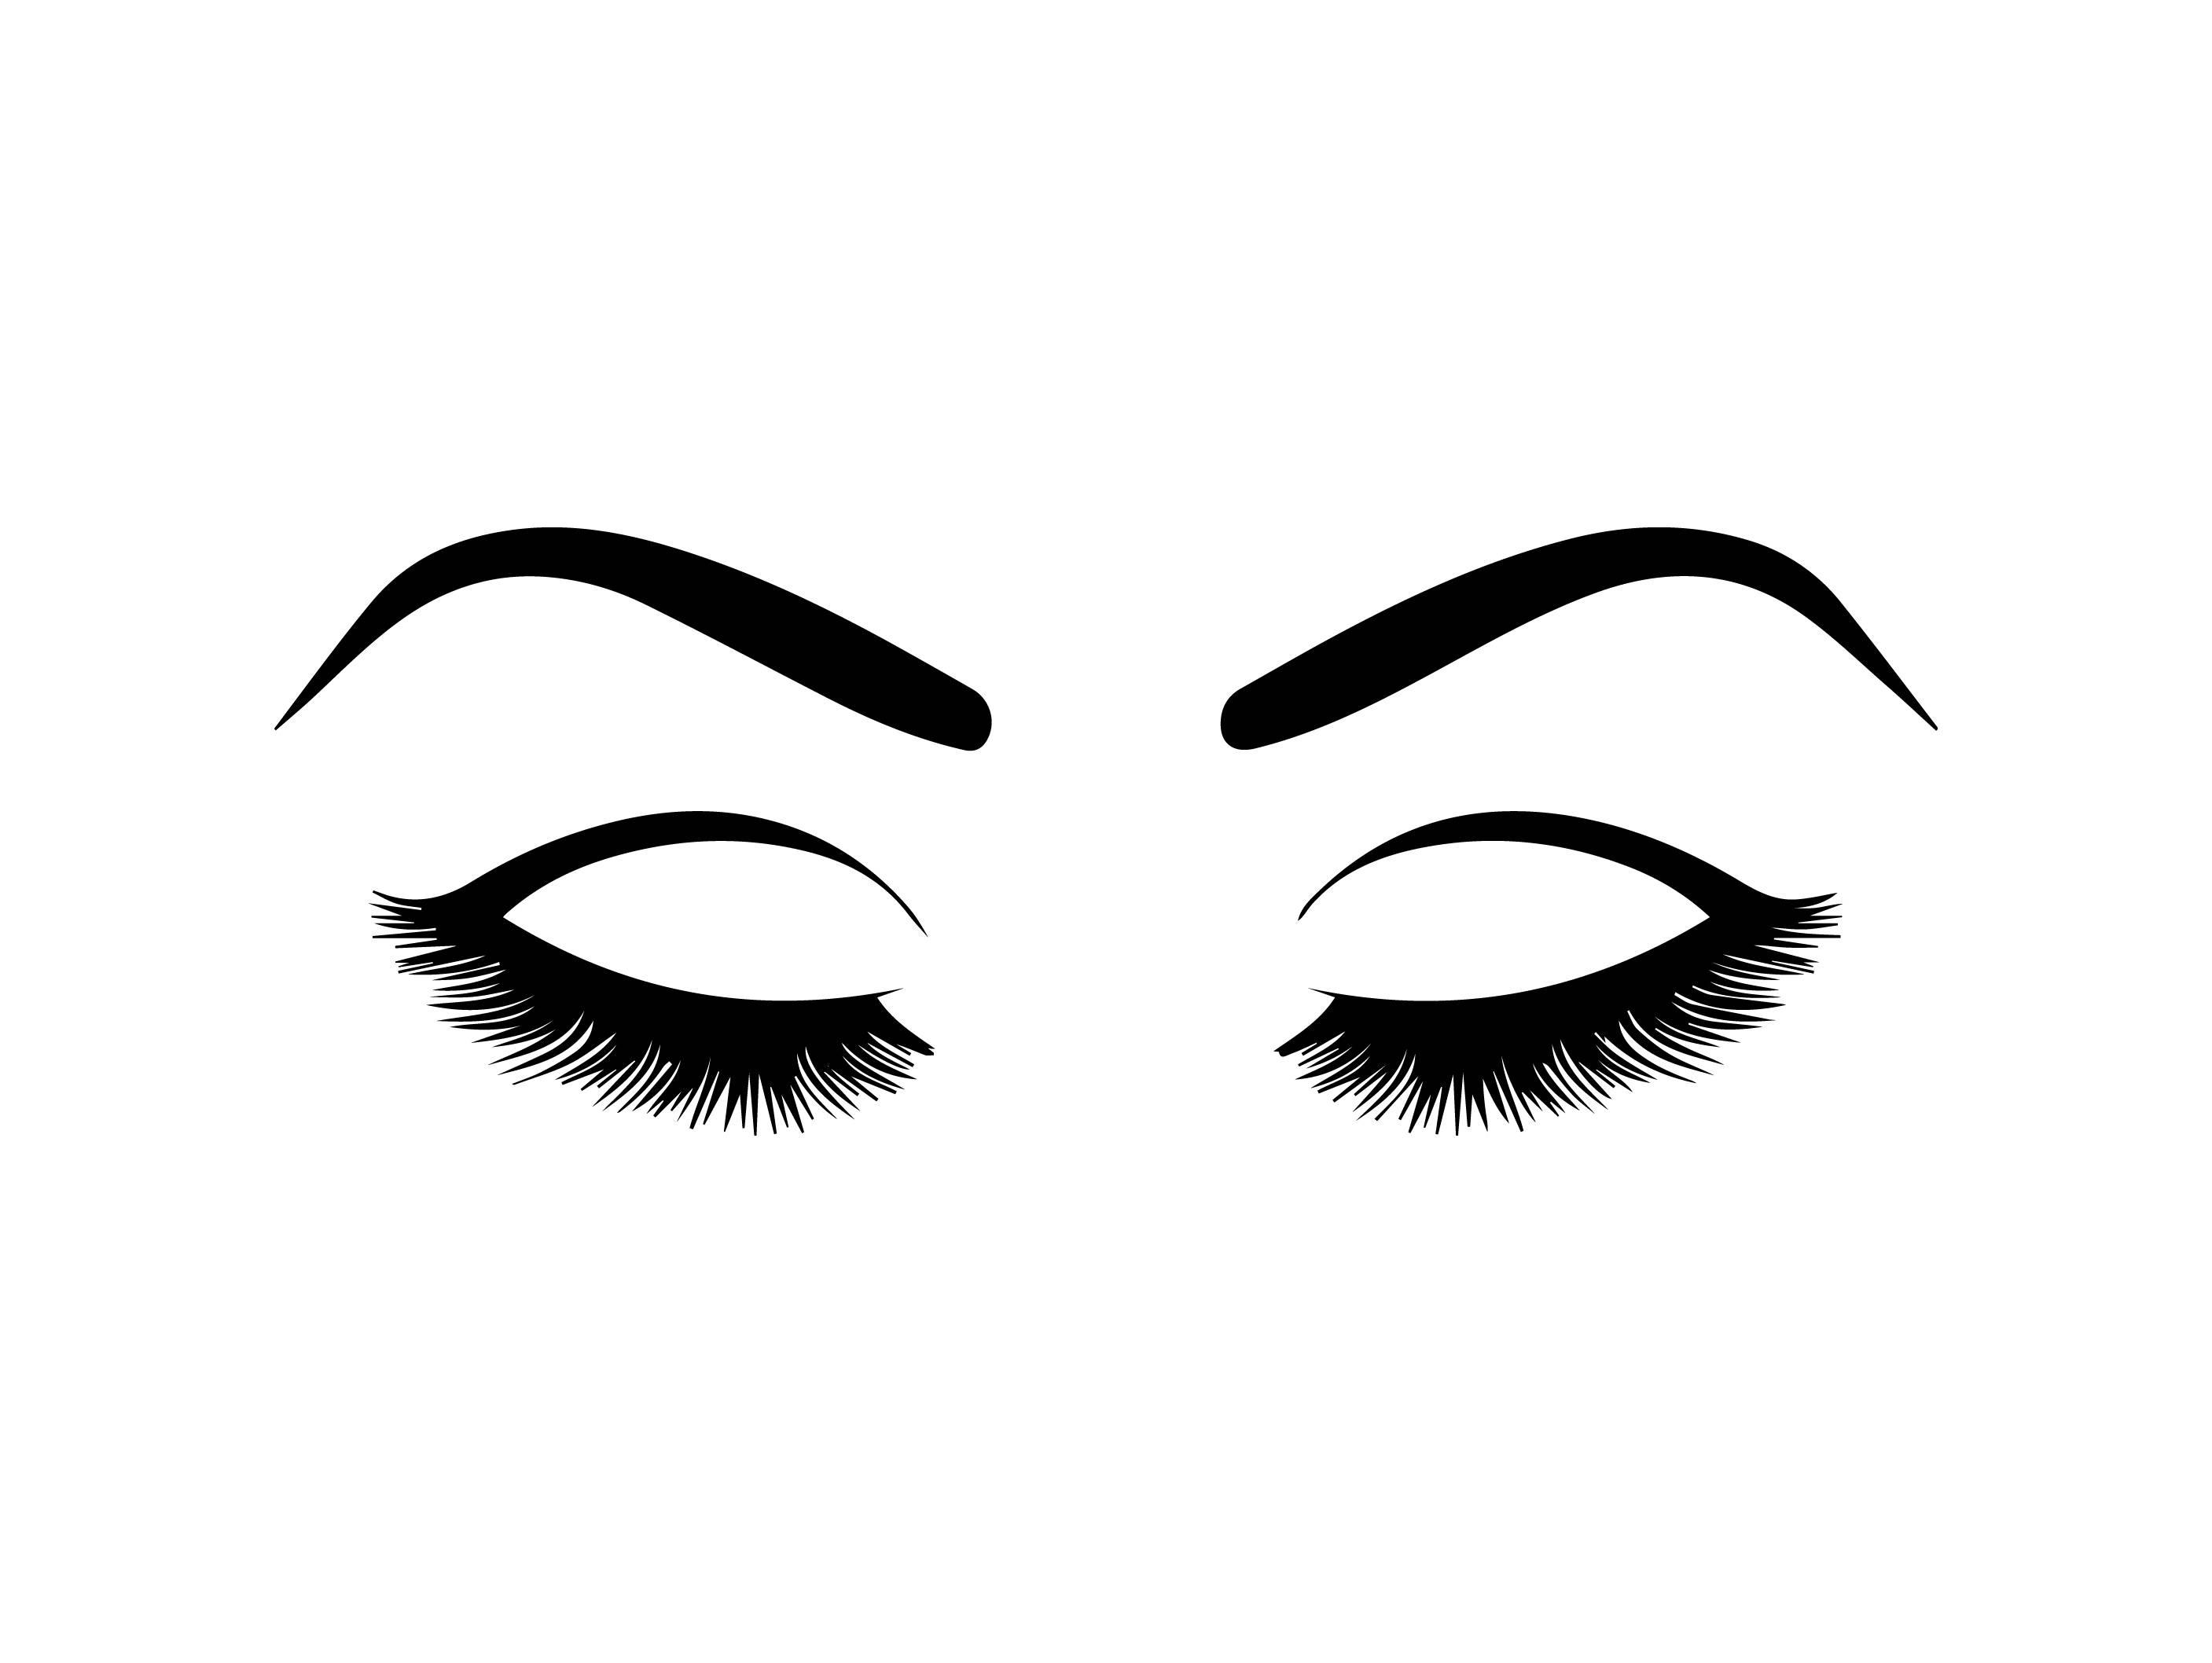 Eyelashes vision human female. Eyebrow clipart